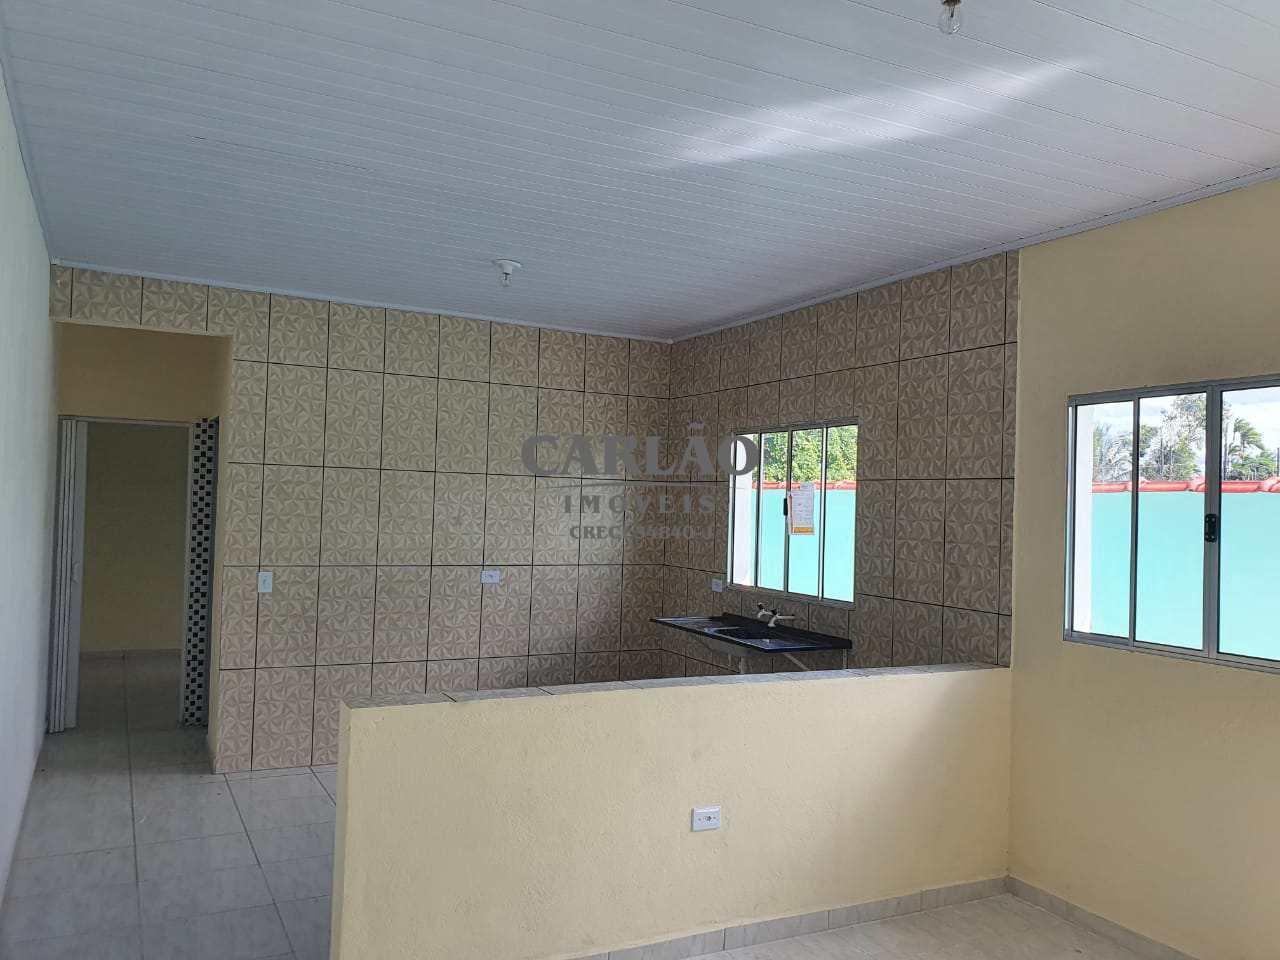 Casa com 2 dorms, Jardim Leonor Jussara, Mongaguá - R$ 175 mil, Cod: 353351